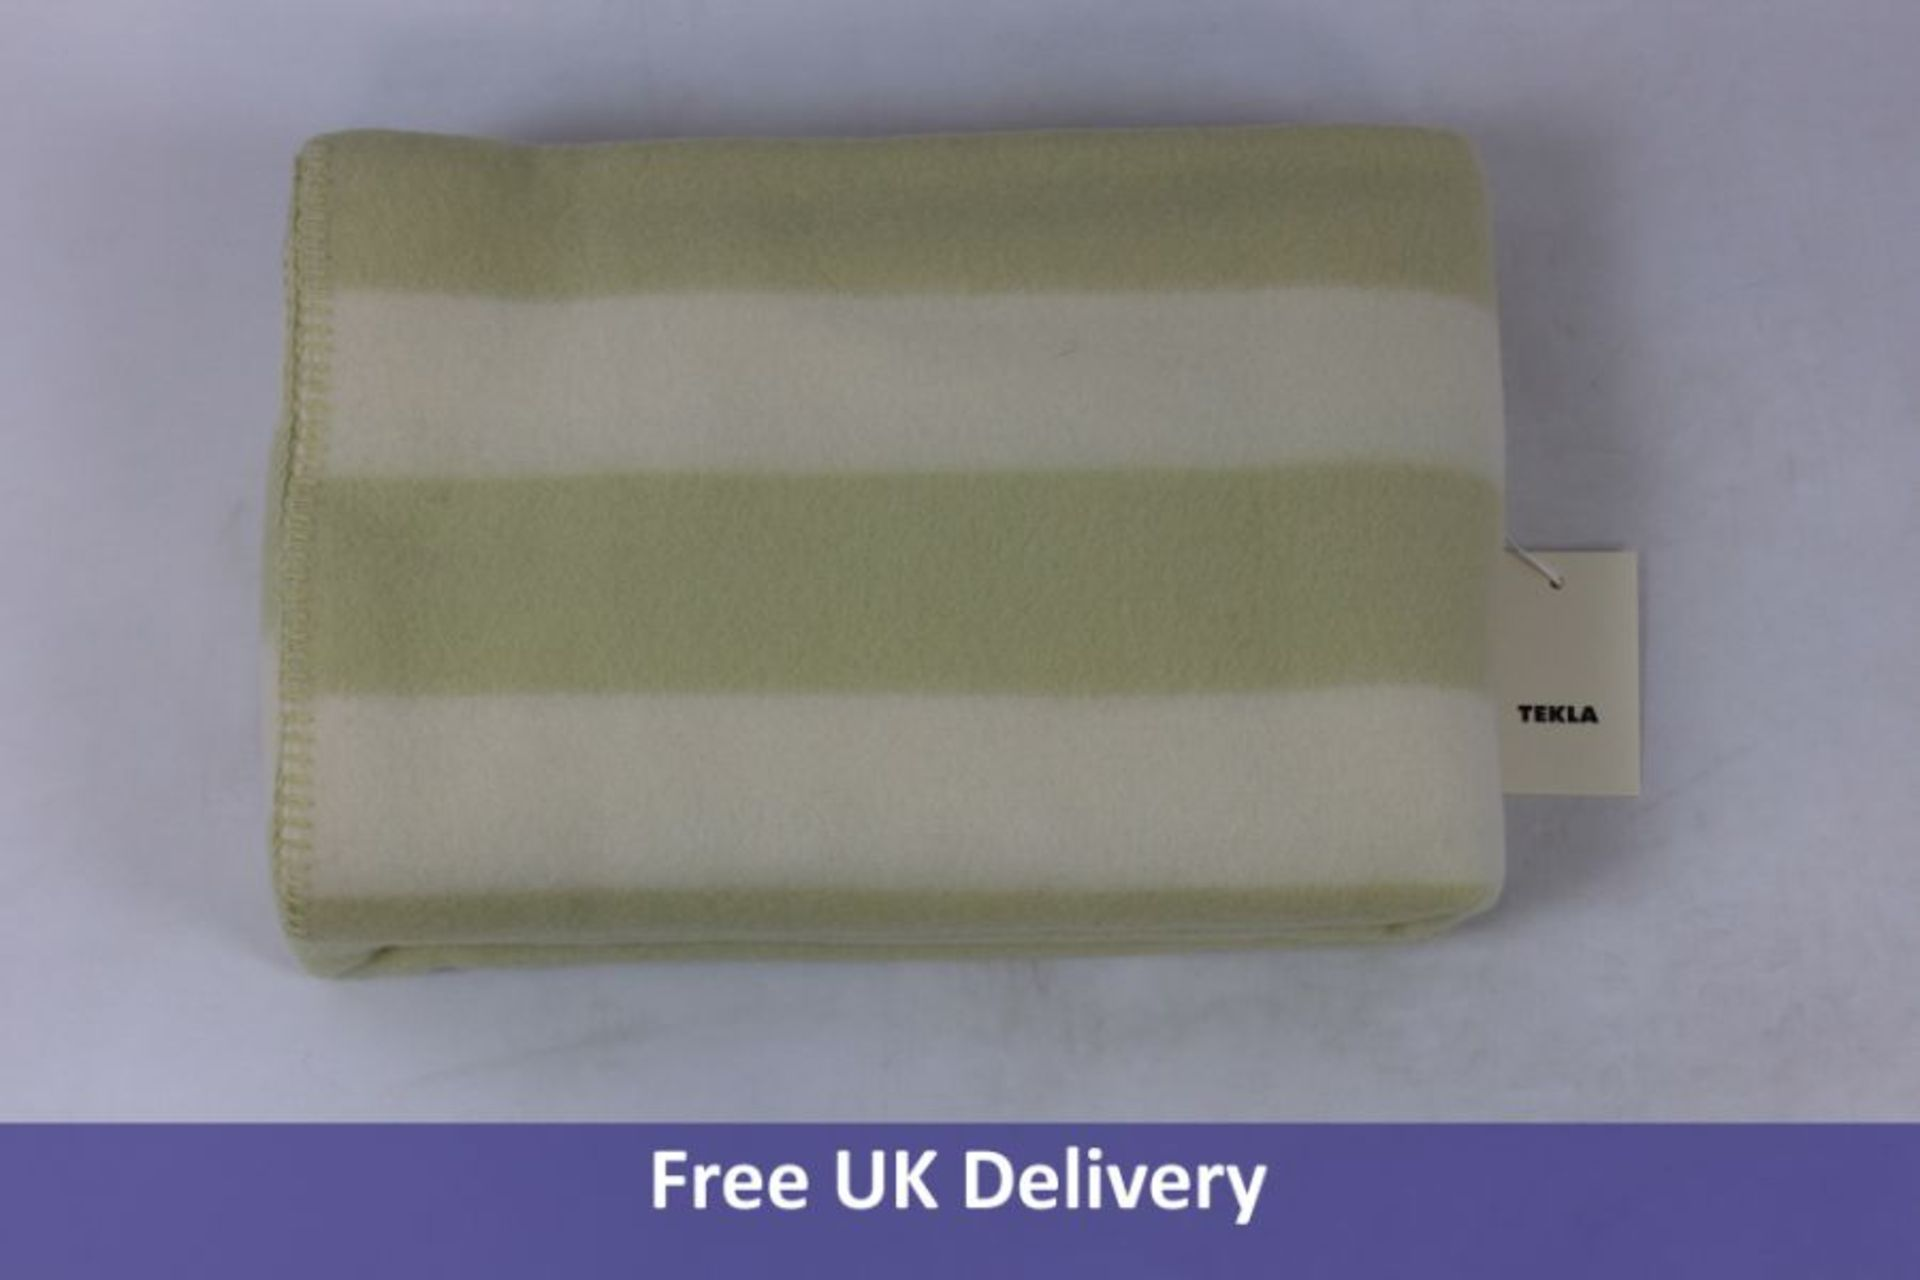 Tekla Pure New Wool Blanket, Yellow & White